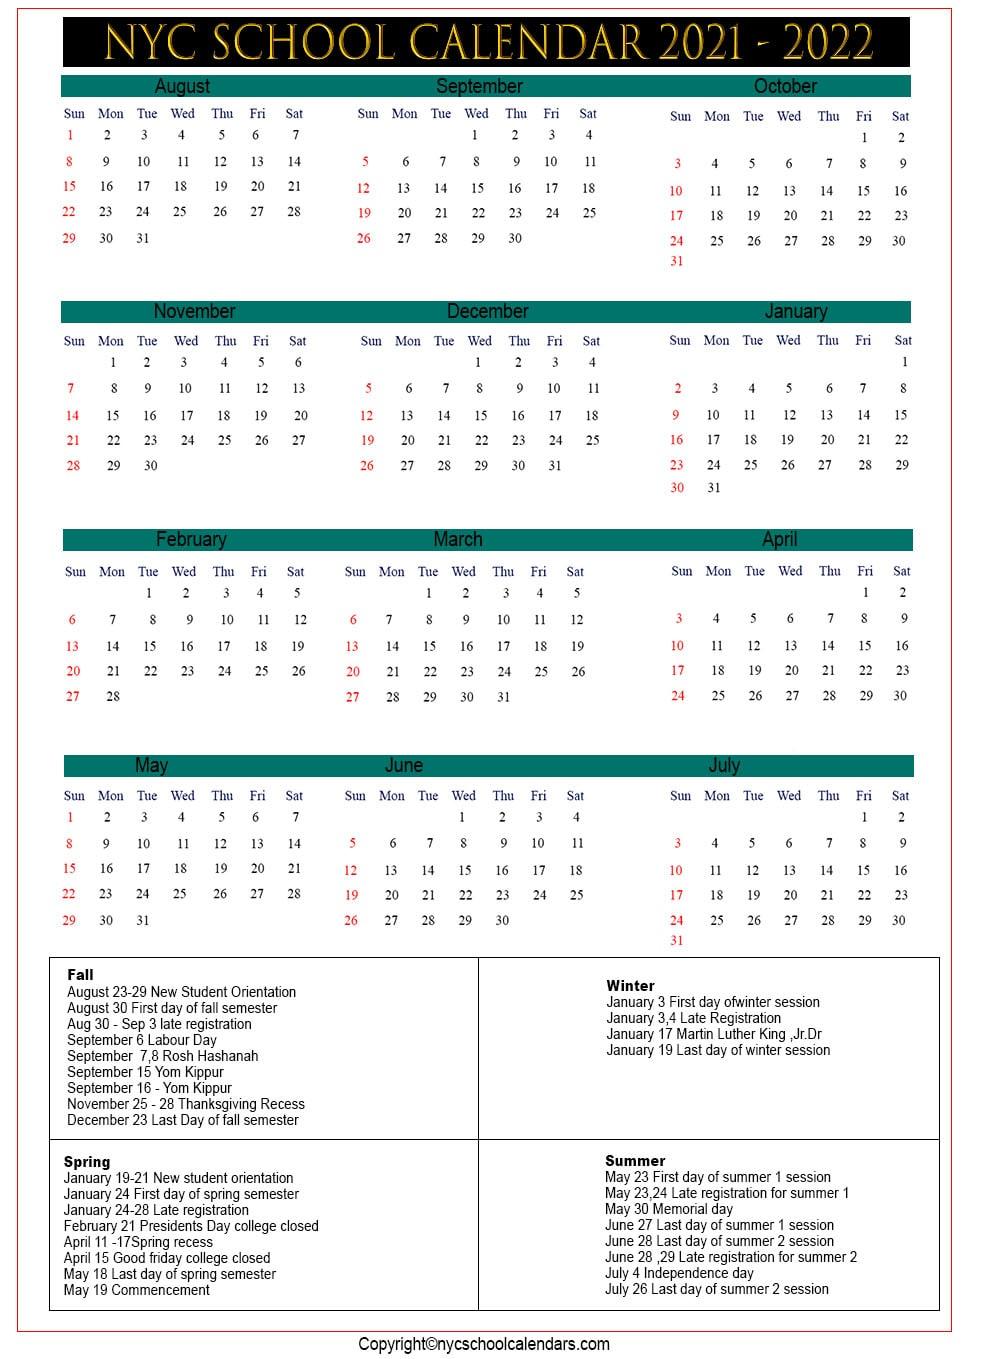 Nyc School Calendar 2021 ✅❤️ Regarding Harrison School District 2 Calendar 2021